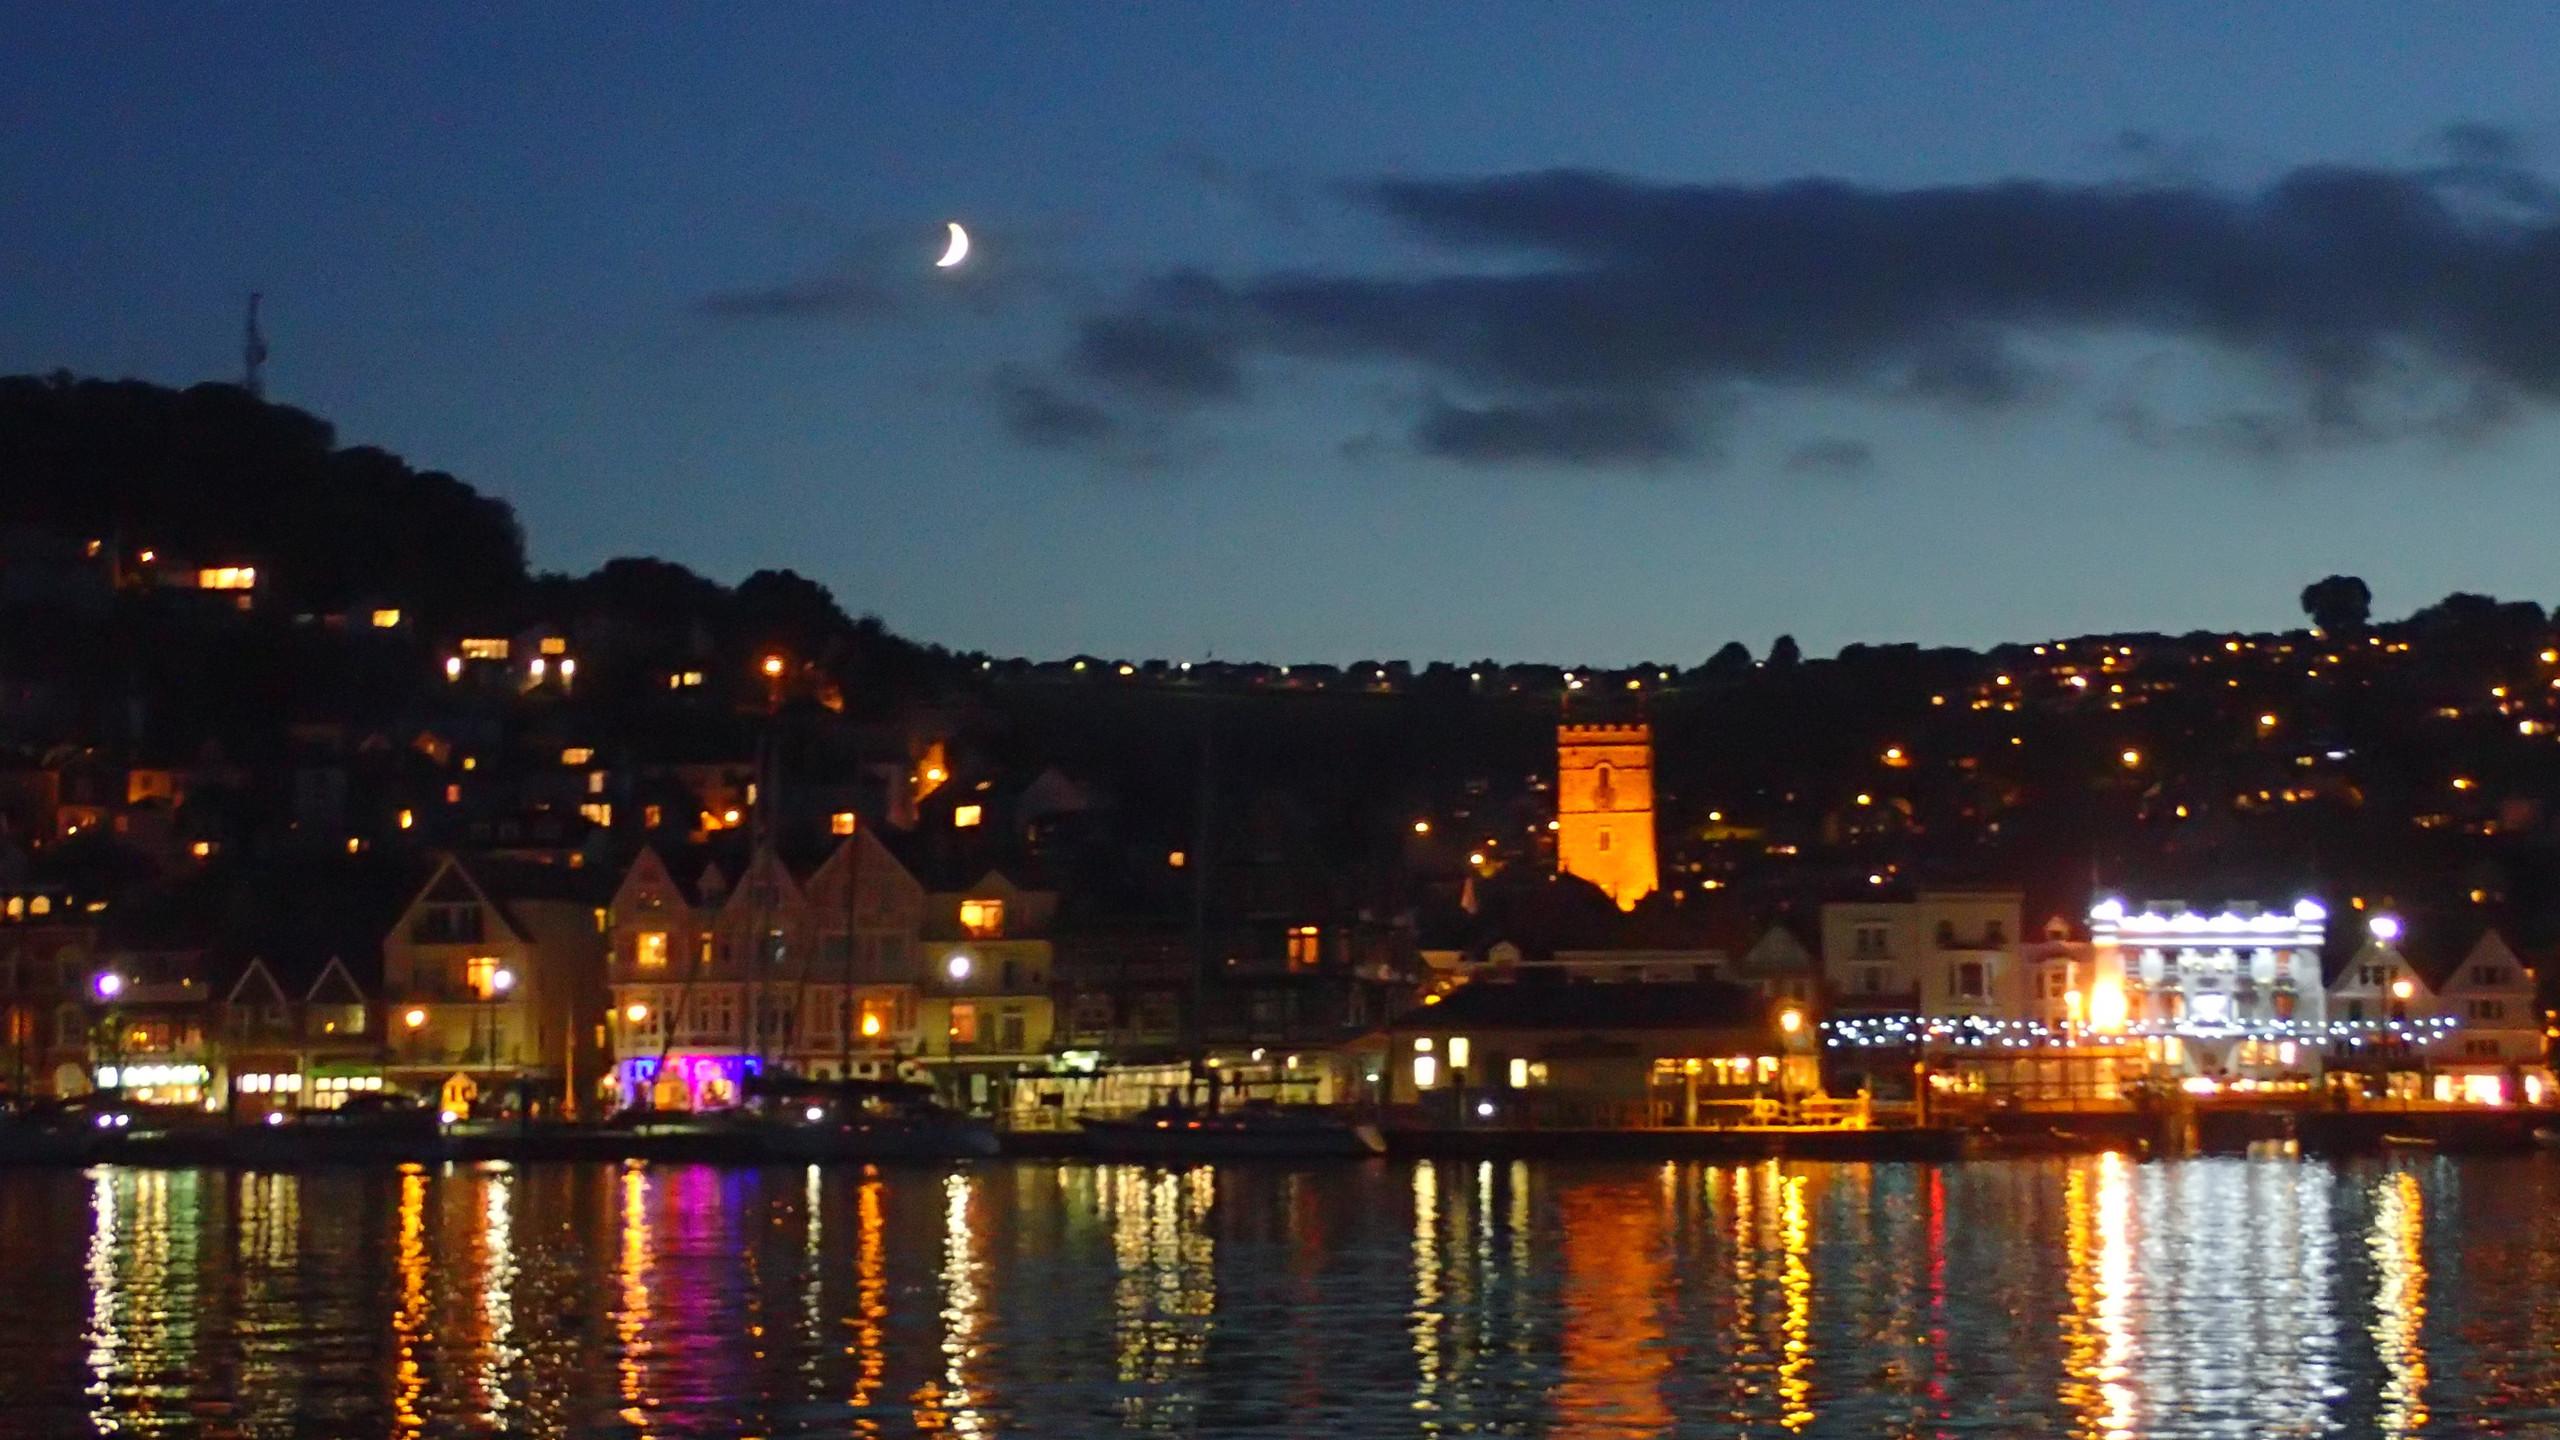 Dartmouth by moonlight